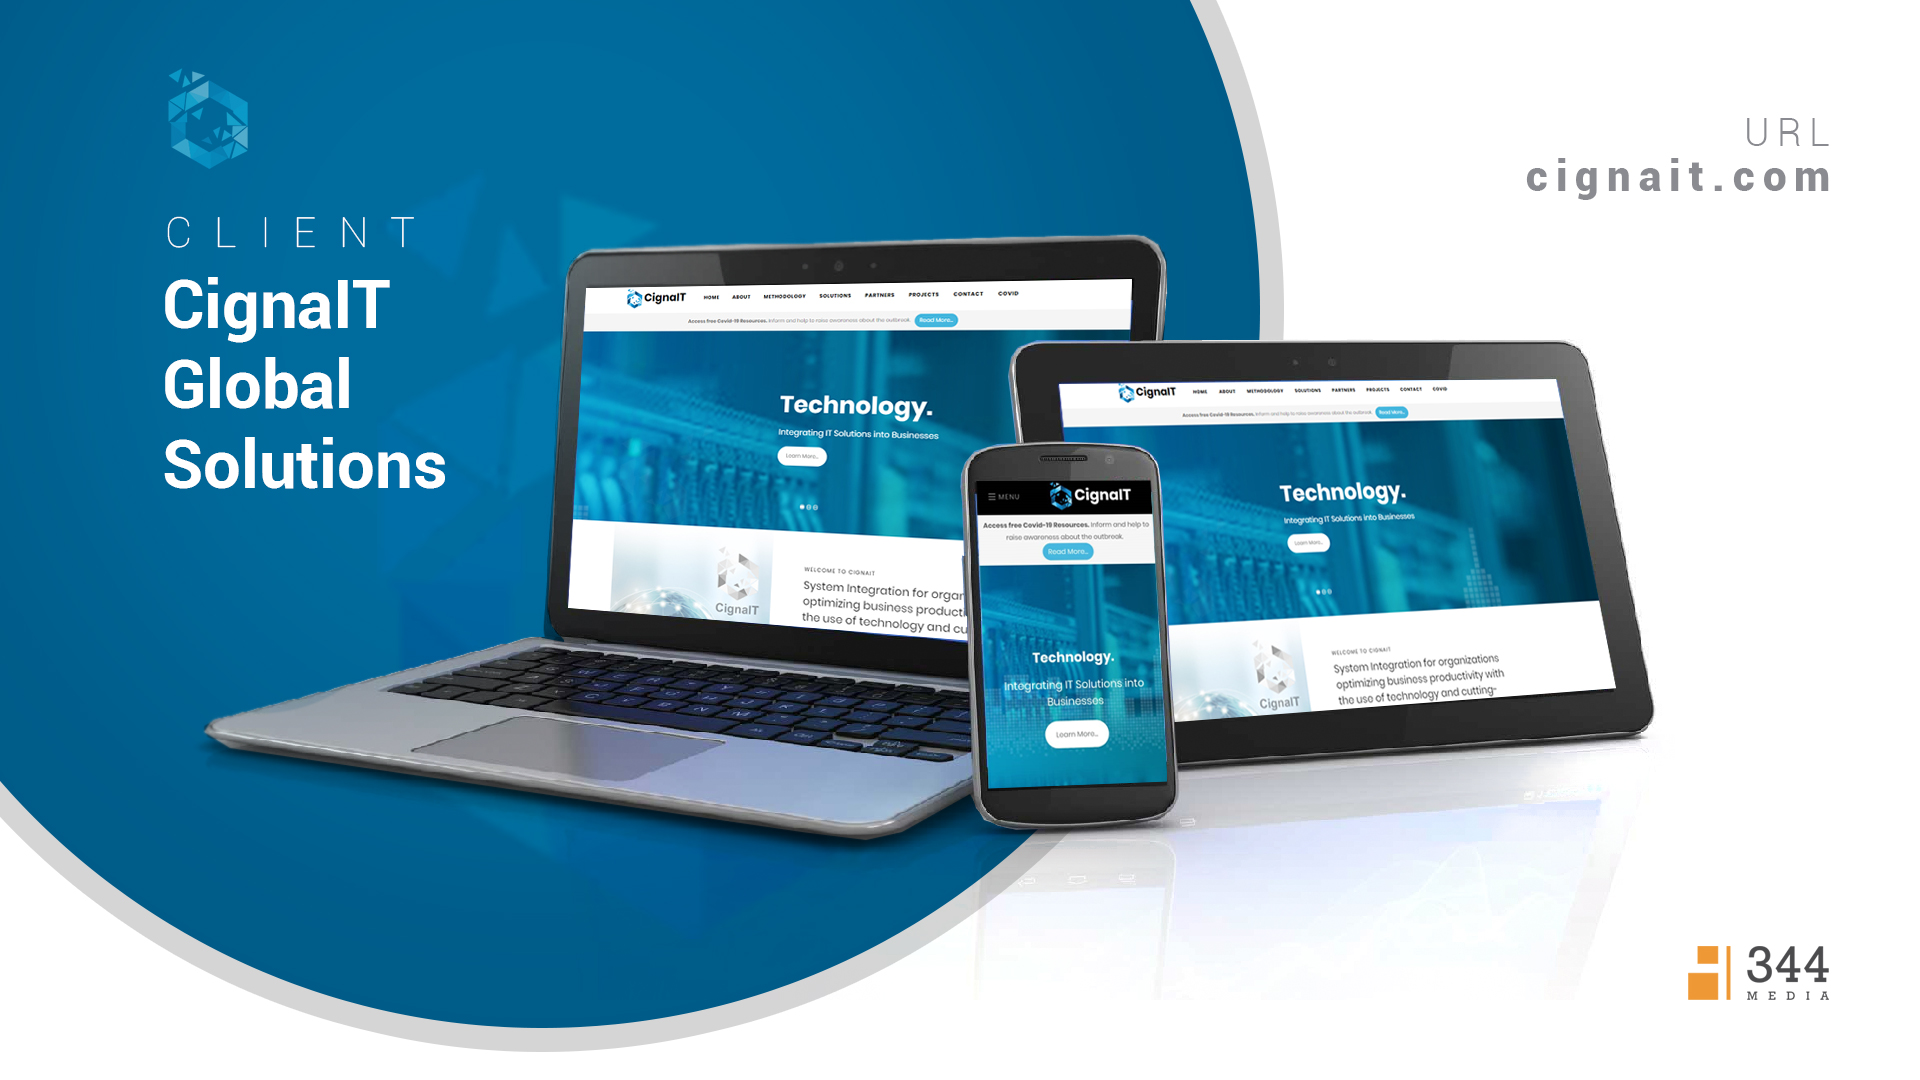 CignaIT Website